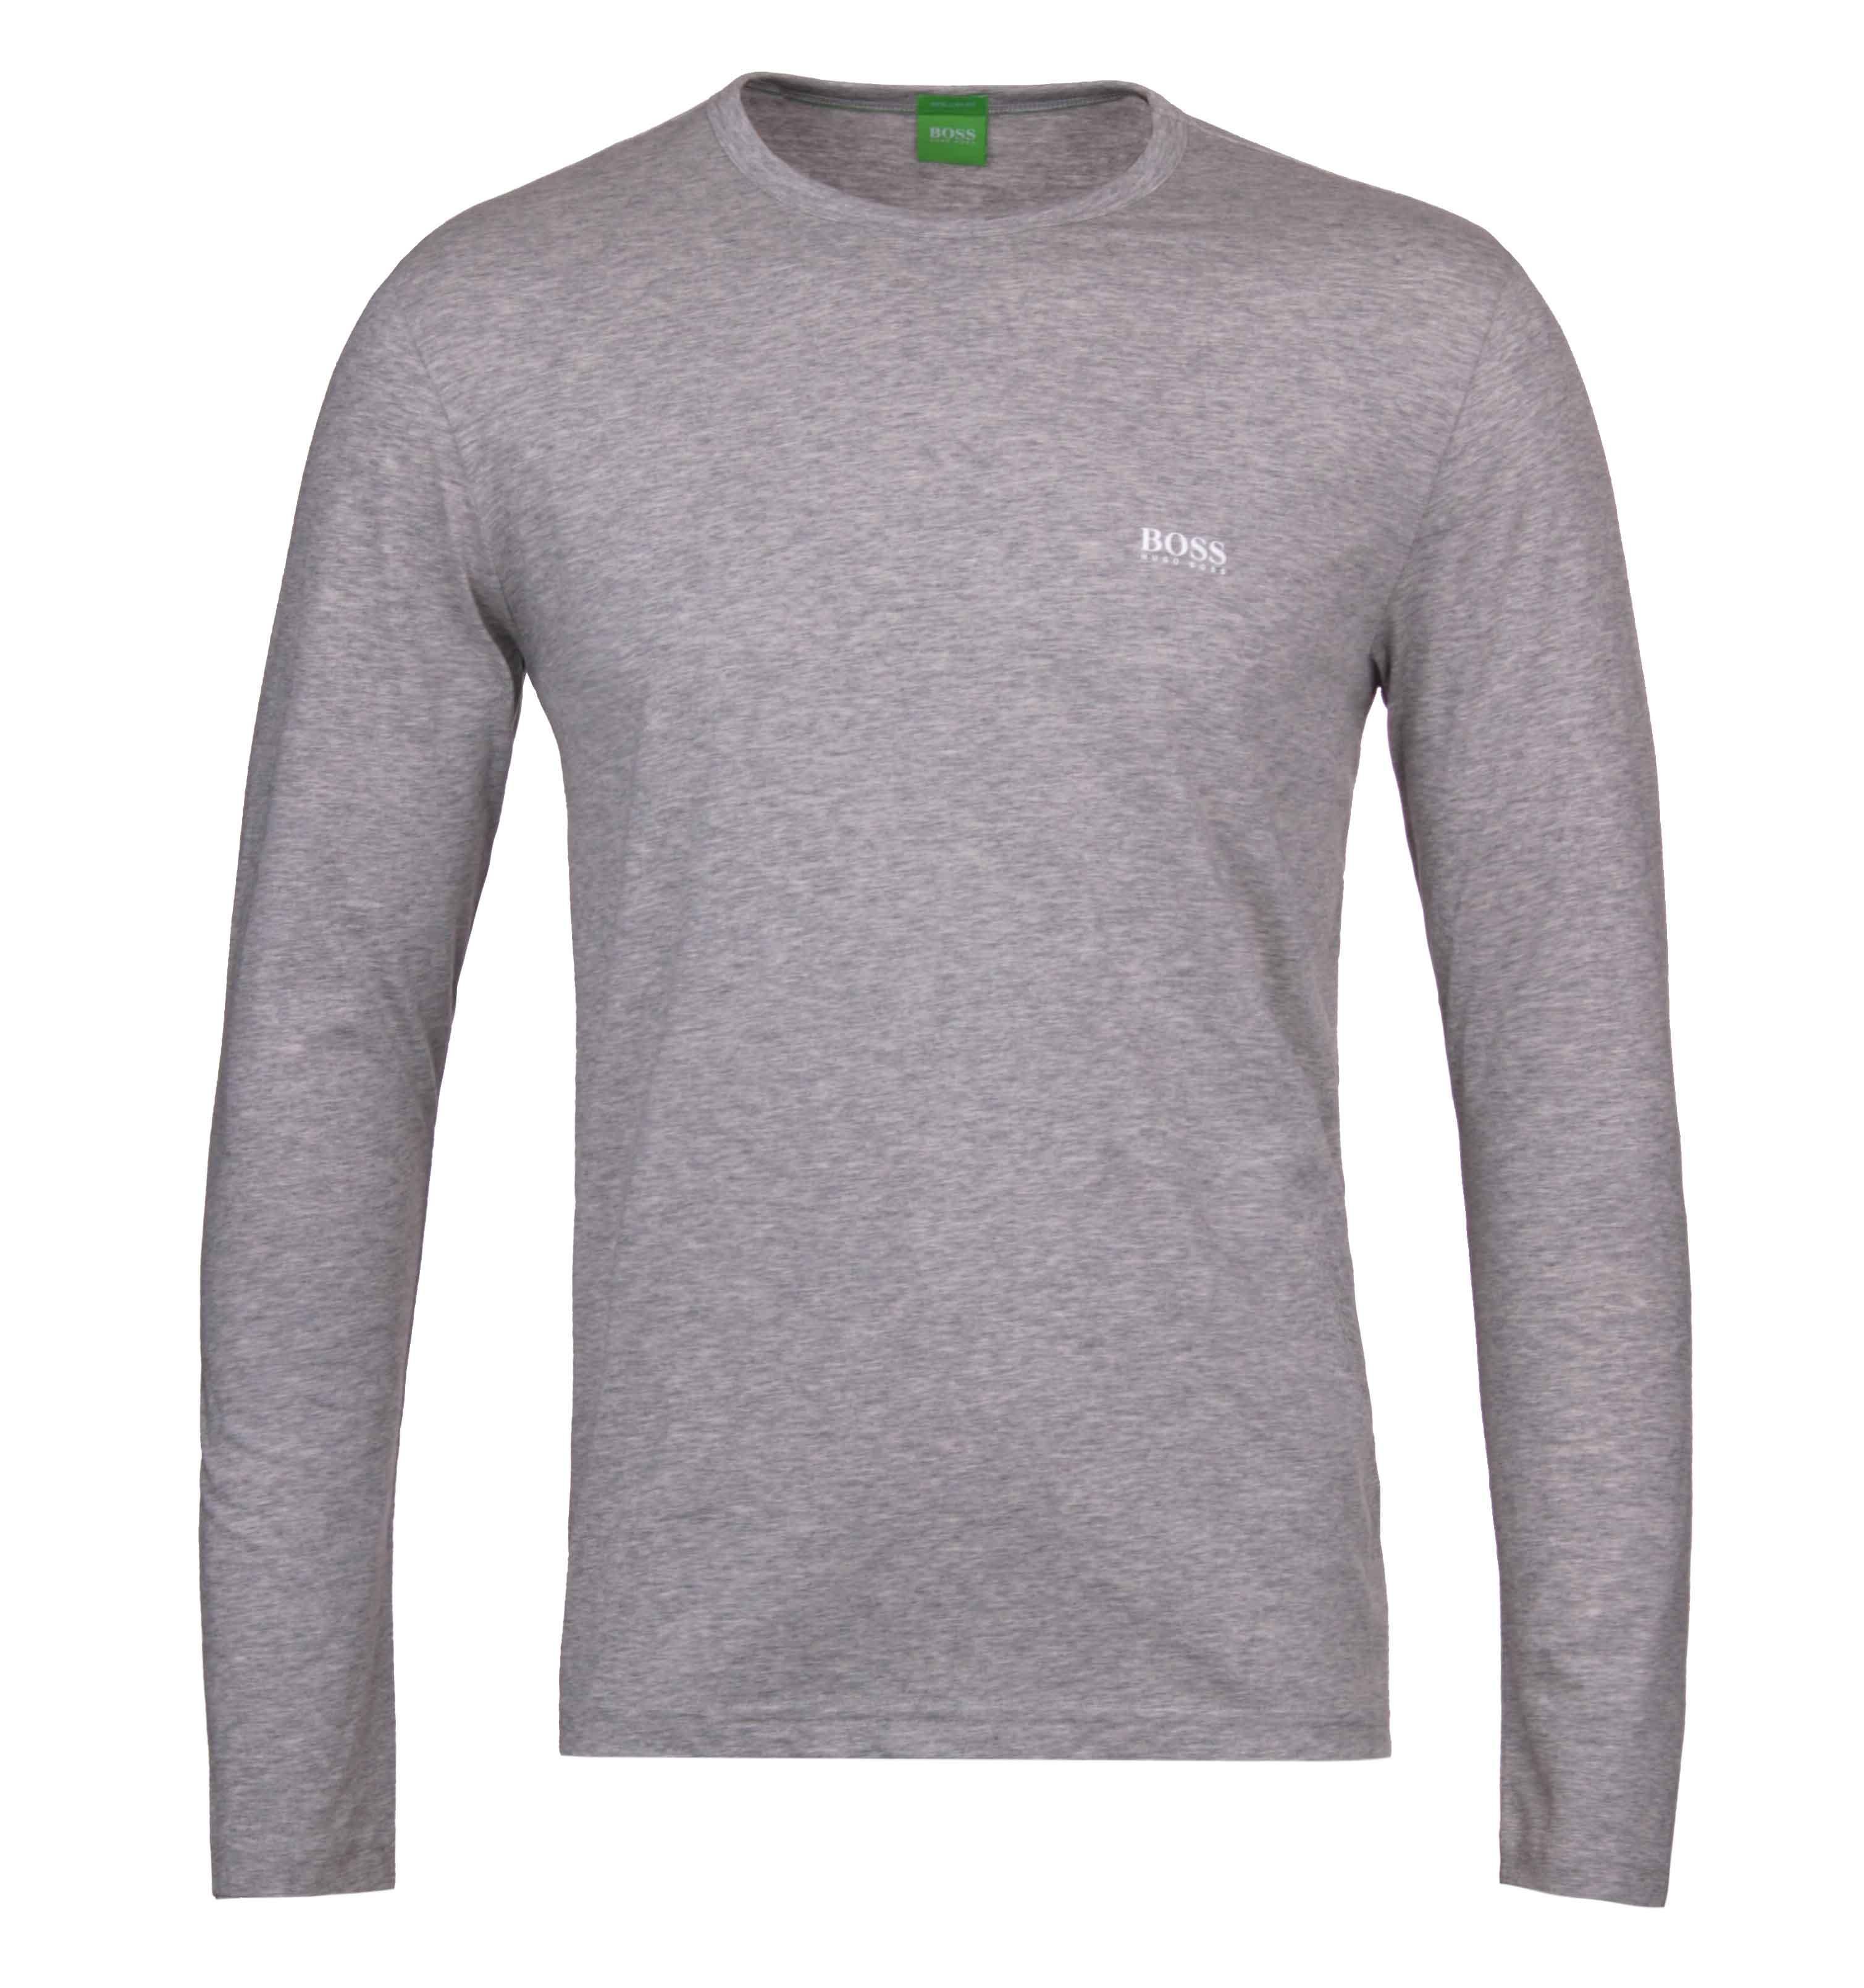 Lyst boss green togn grey marl long sleeve t shirt in for Grey marl t shirt